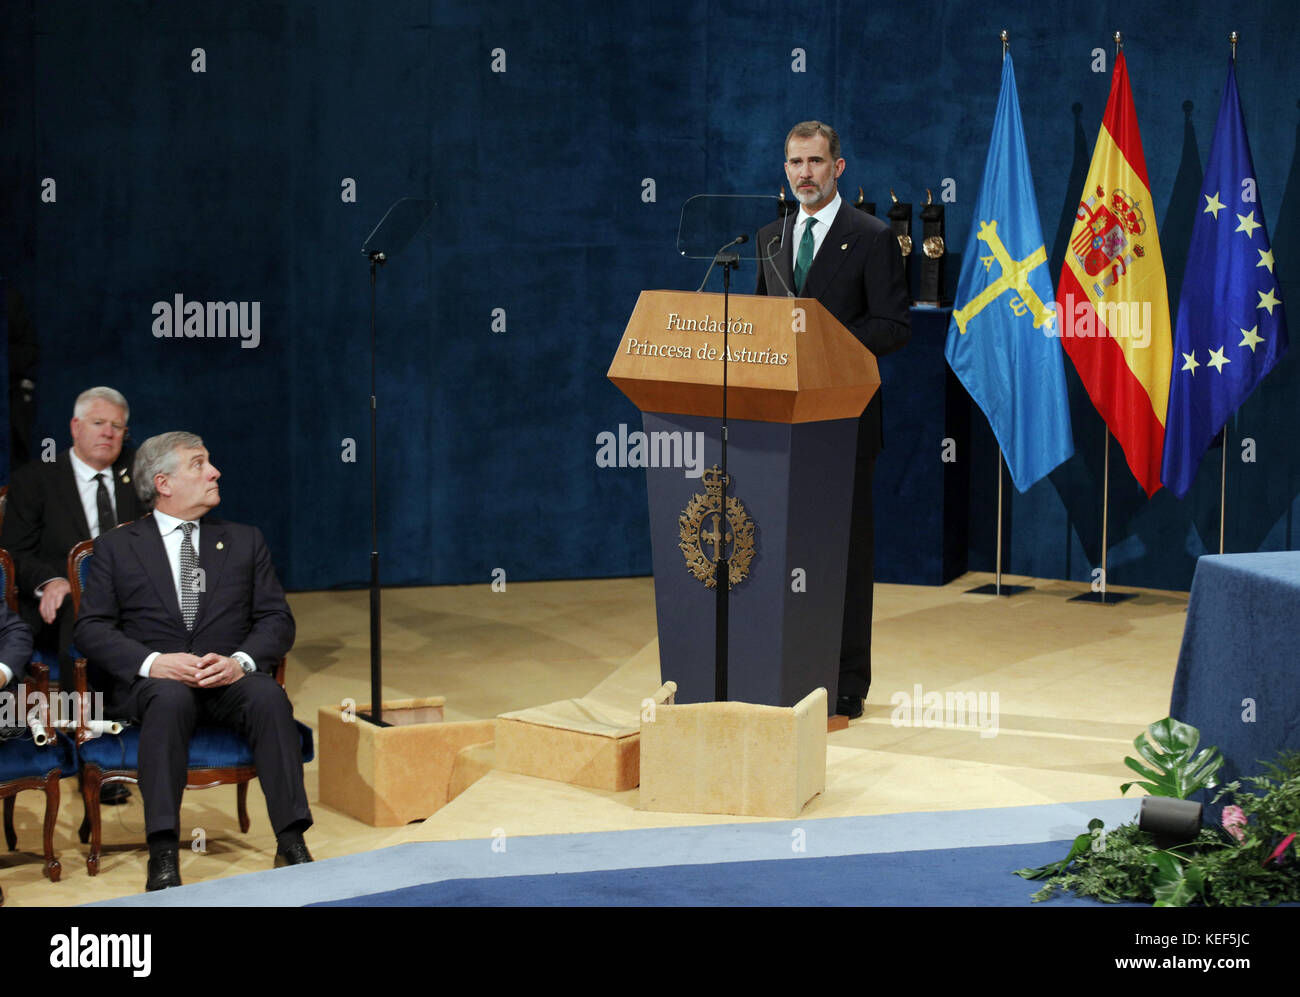 Oviedo, Spain. 20th Oct, 2017. King Felipe VI of Spain (C) speaks during the Princess of Astrurias Awards 2017 at - Stock Image